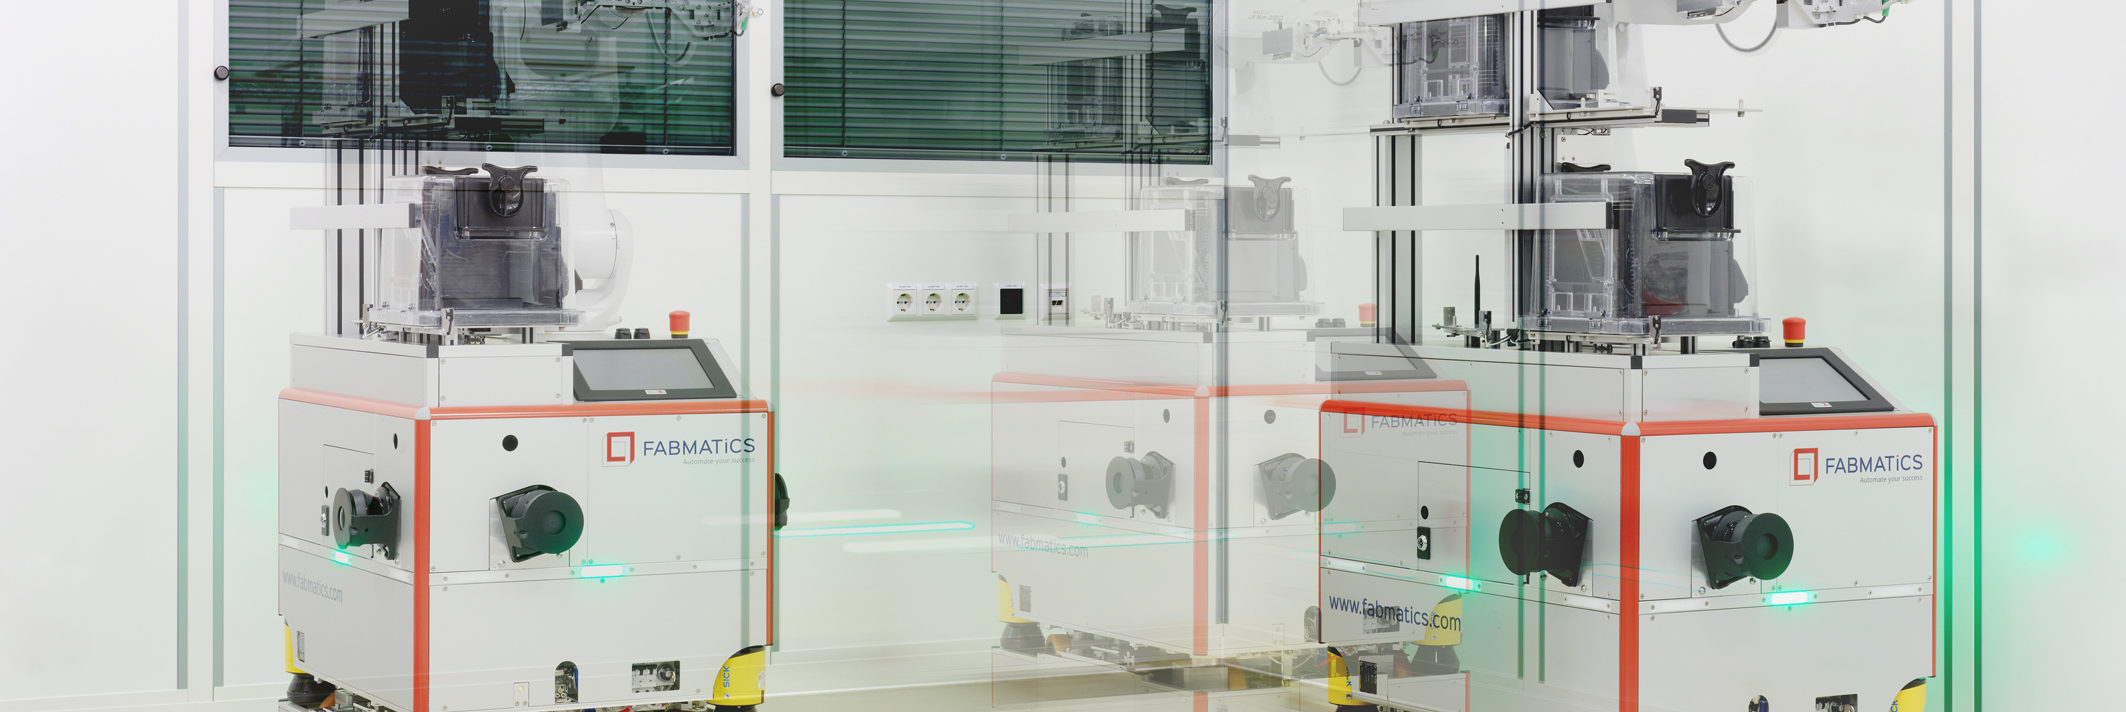 Fabmatics GmbH